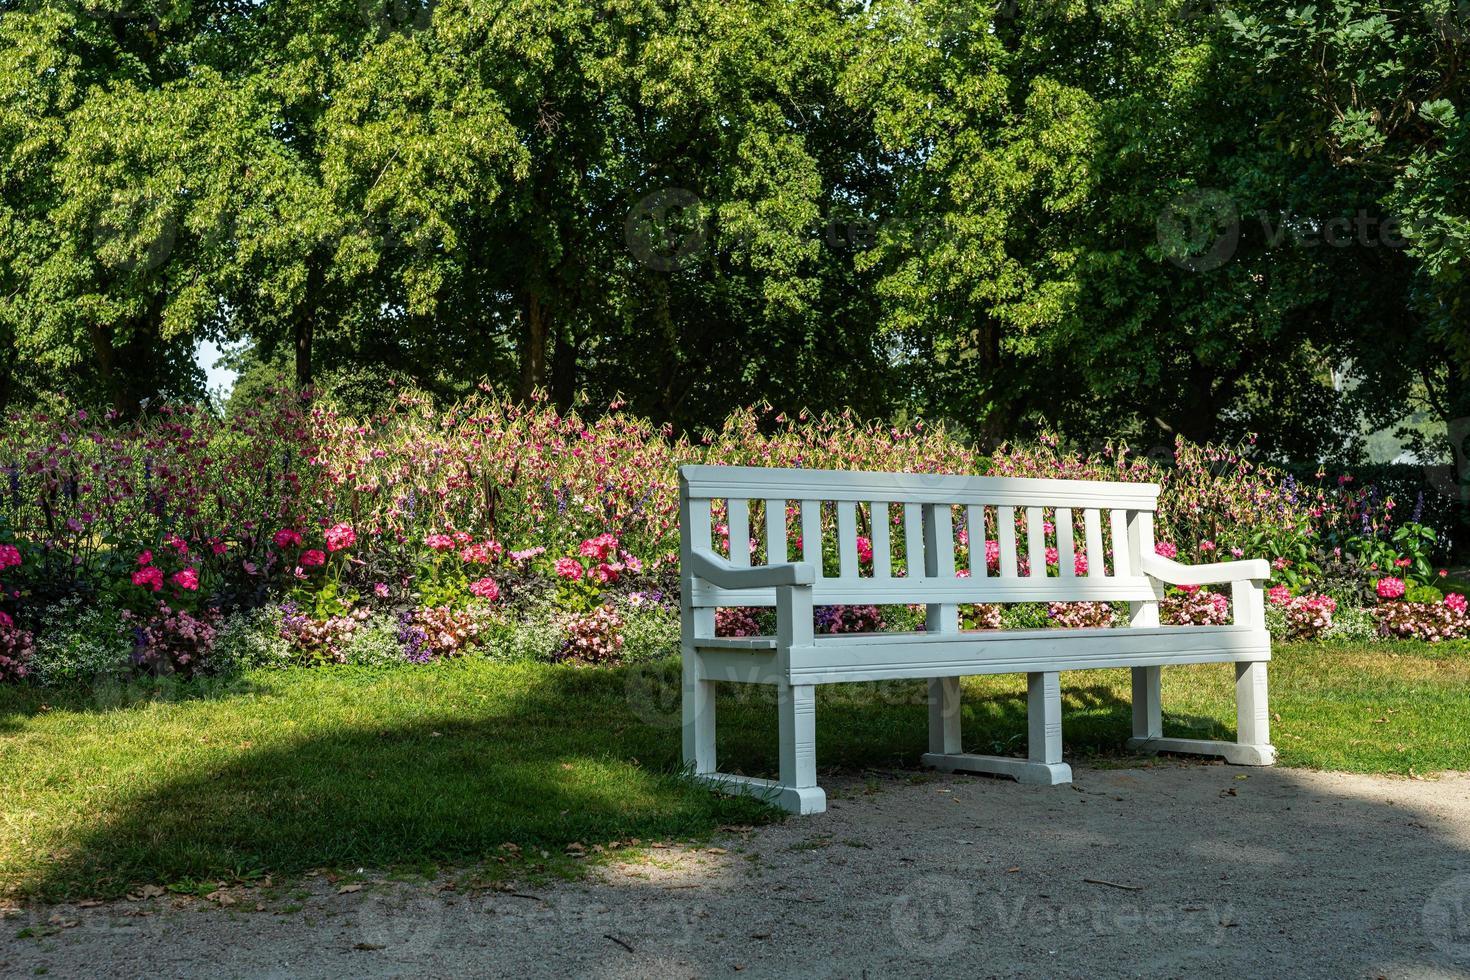 panchina del parco bianco davanti a fiori foto